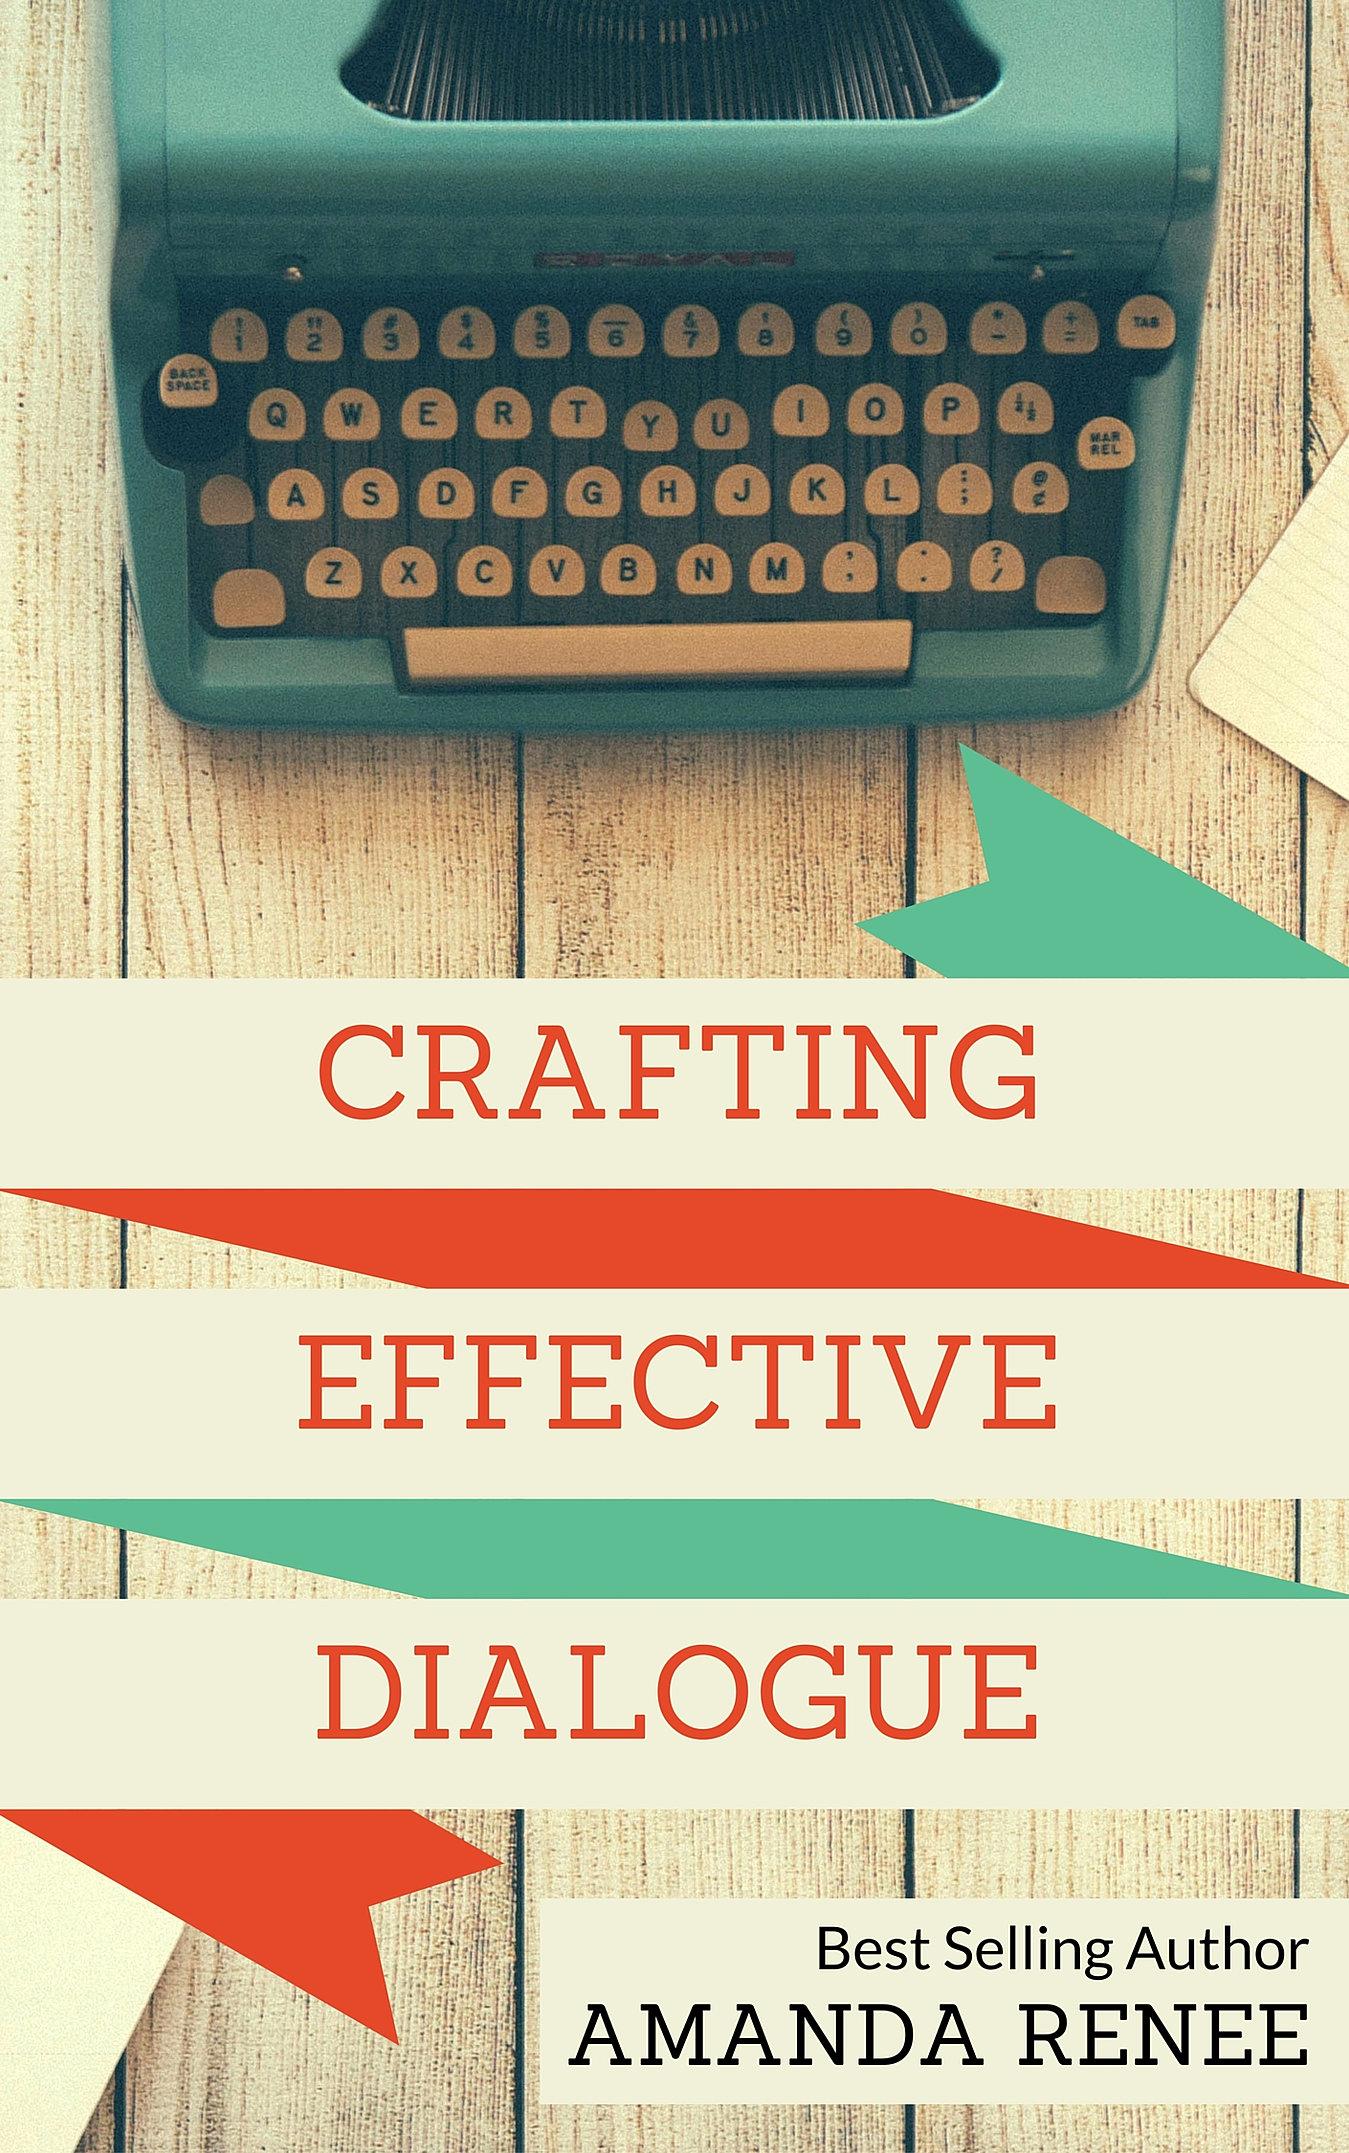 CraftingEffectiveDialogue Cover.jpg